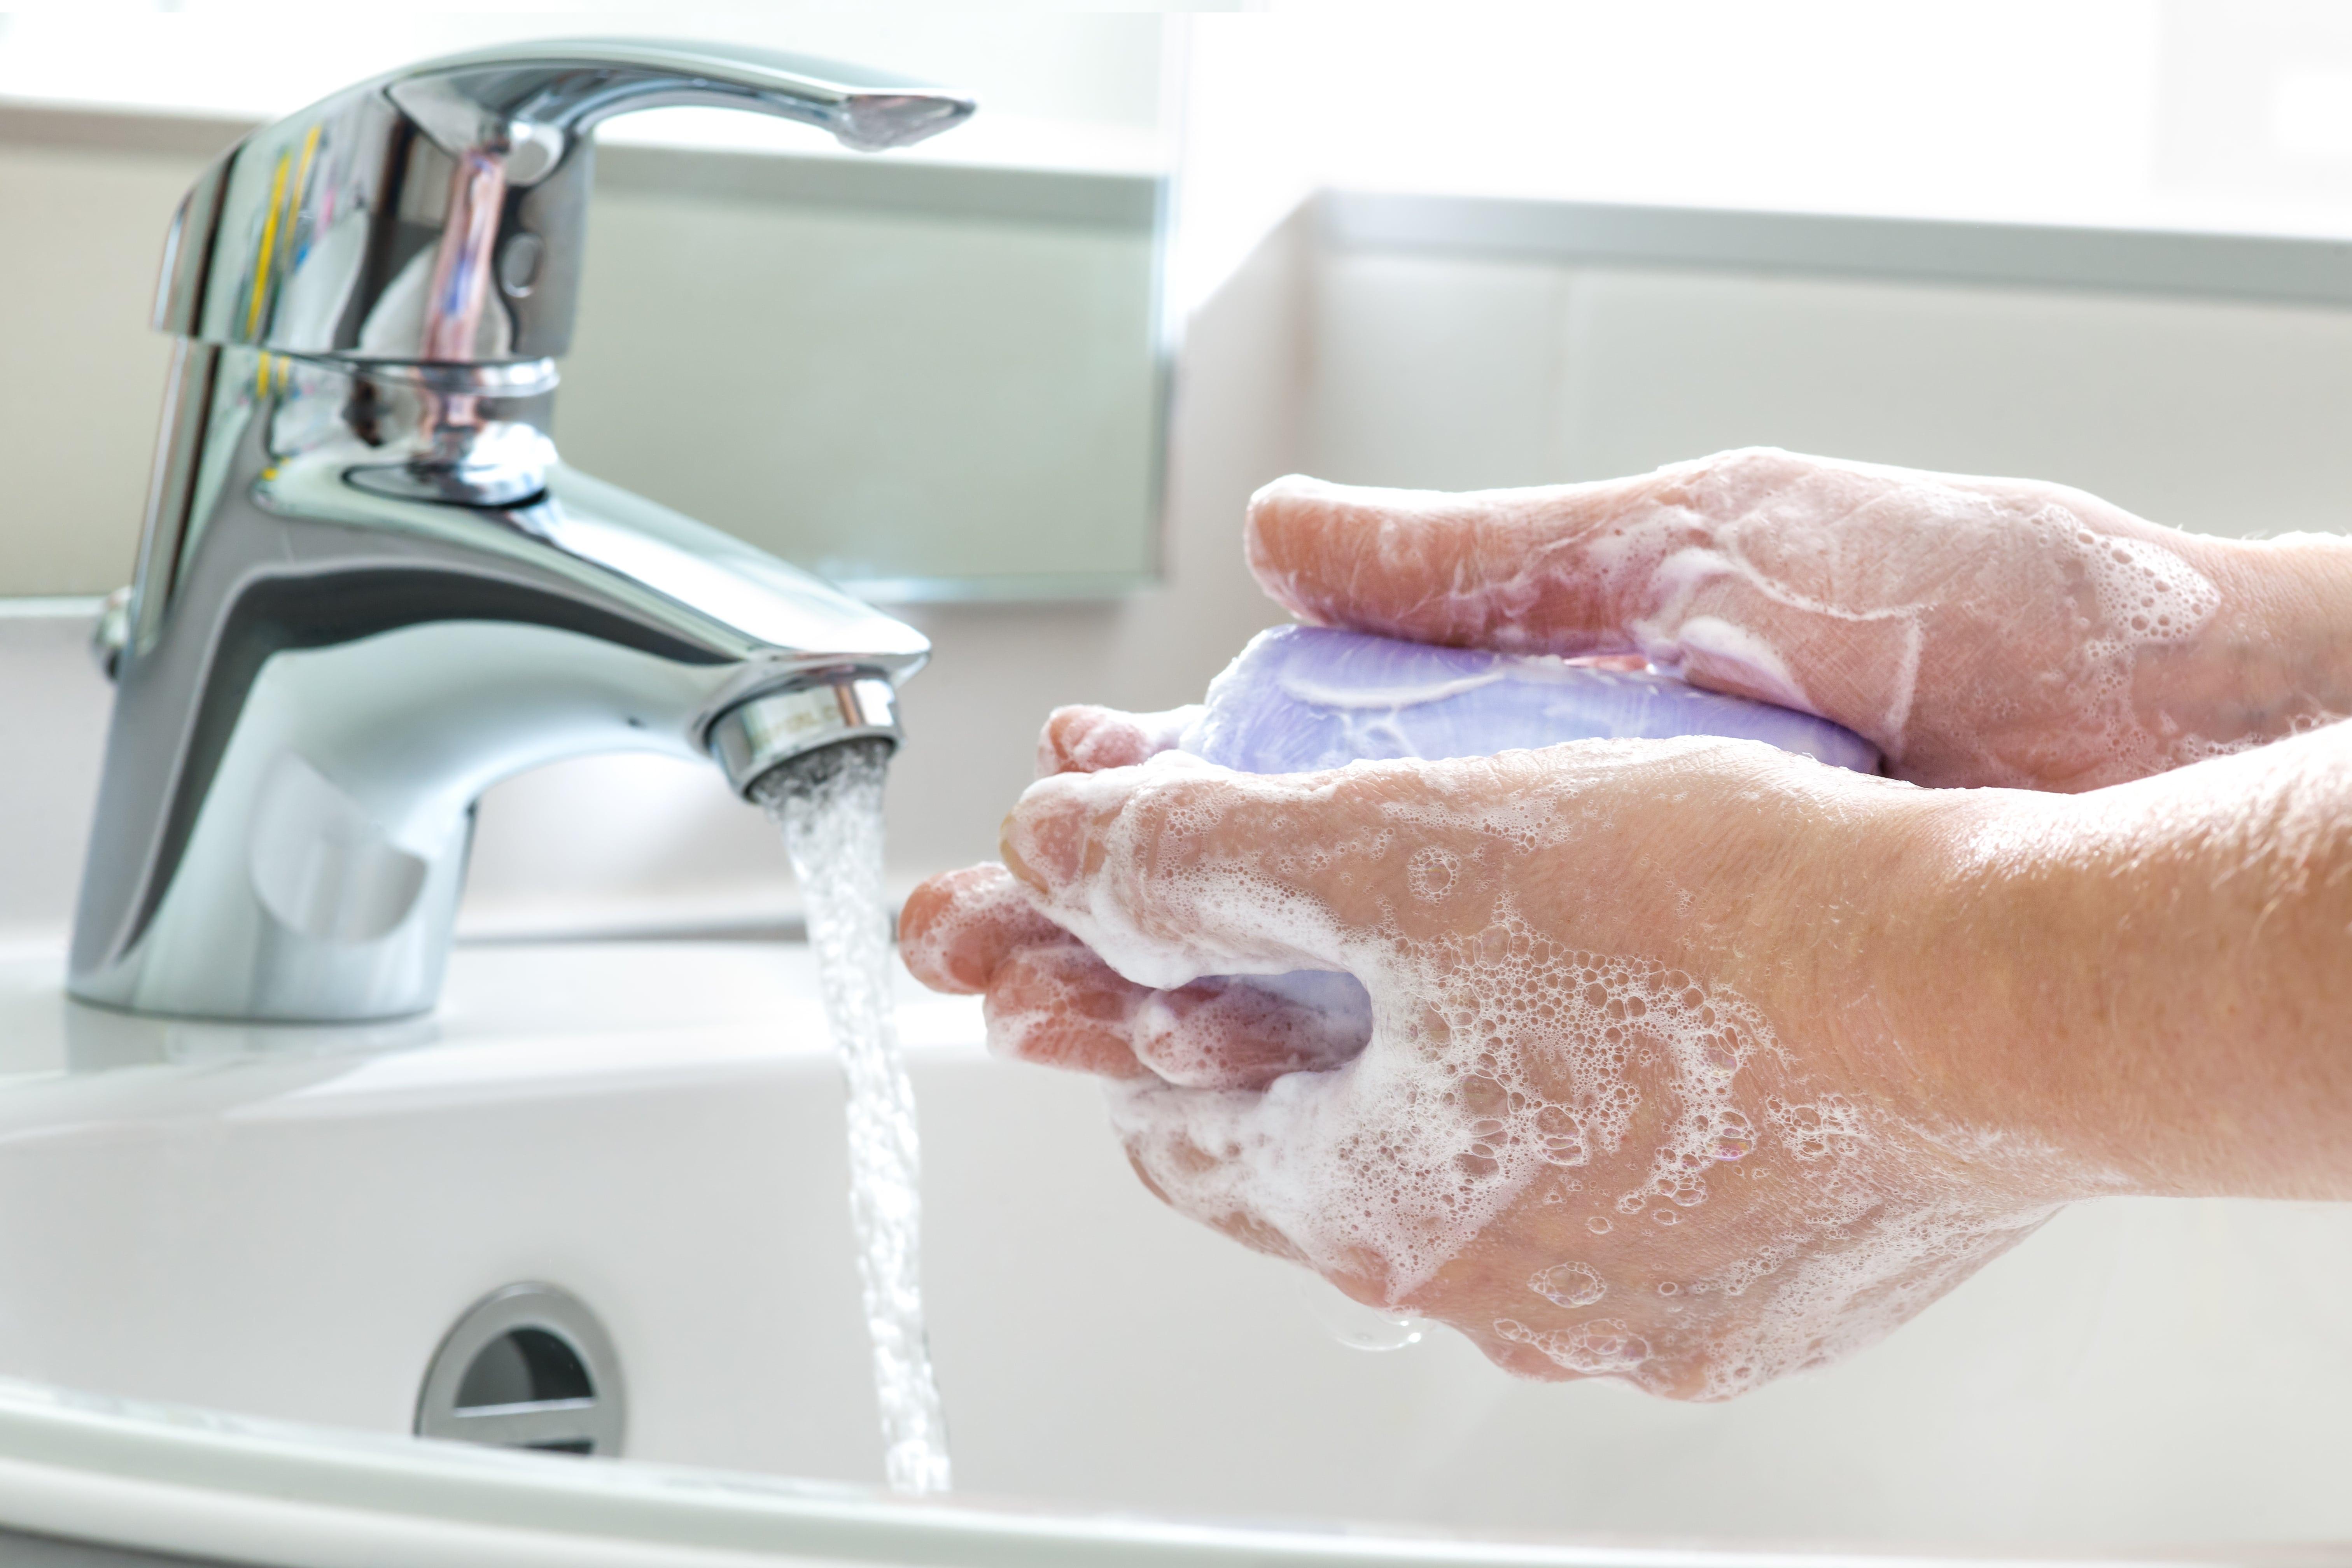 Salmoneloza - infectia cu bacteria Salmonella